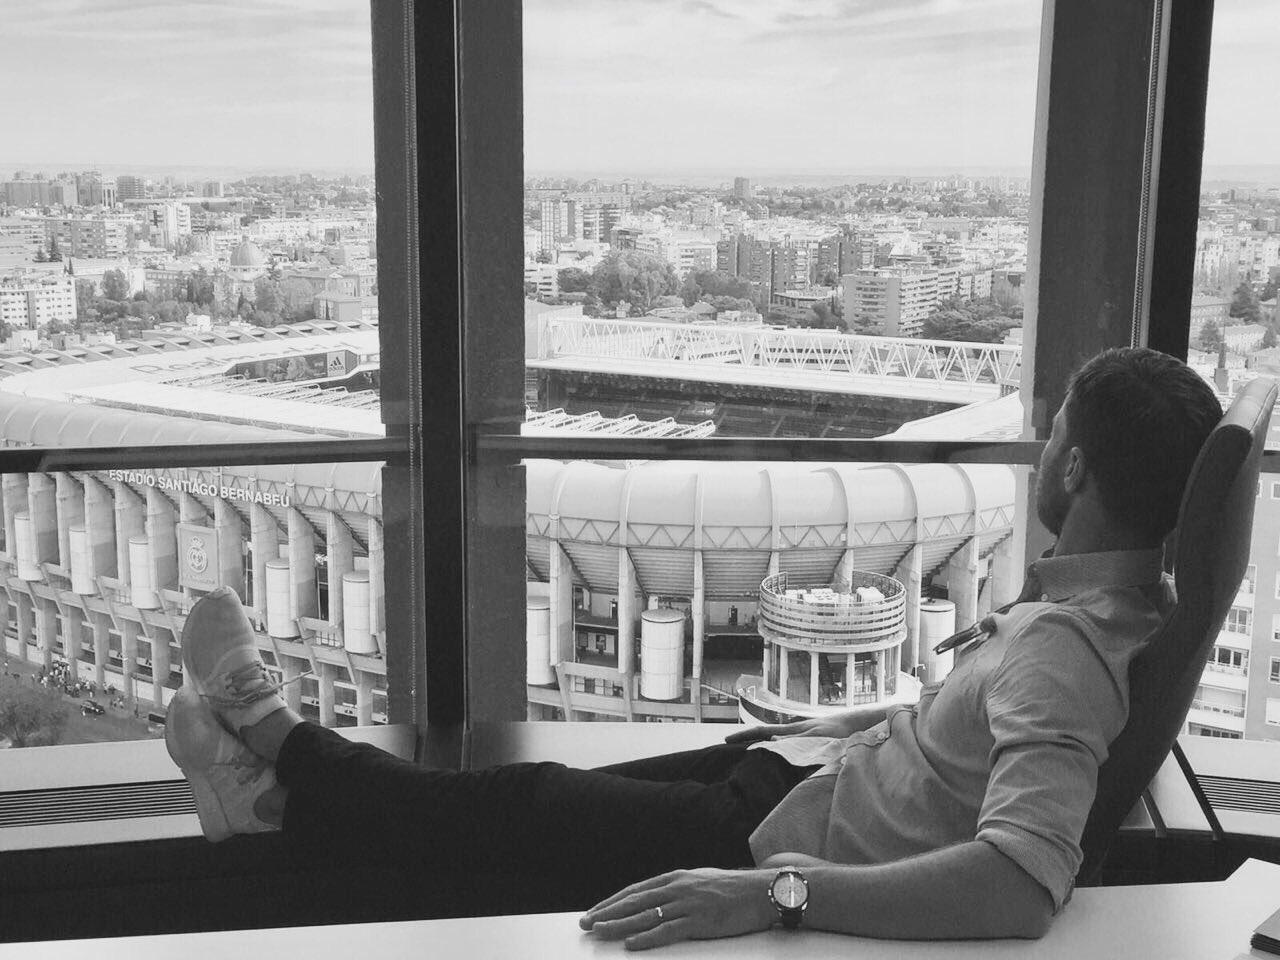 Tomorrow is a special game.         Back to Bernabéu. #miasanmia https://t.co/uM7aSQyq9u